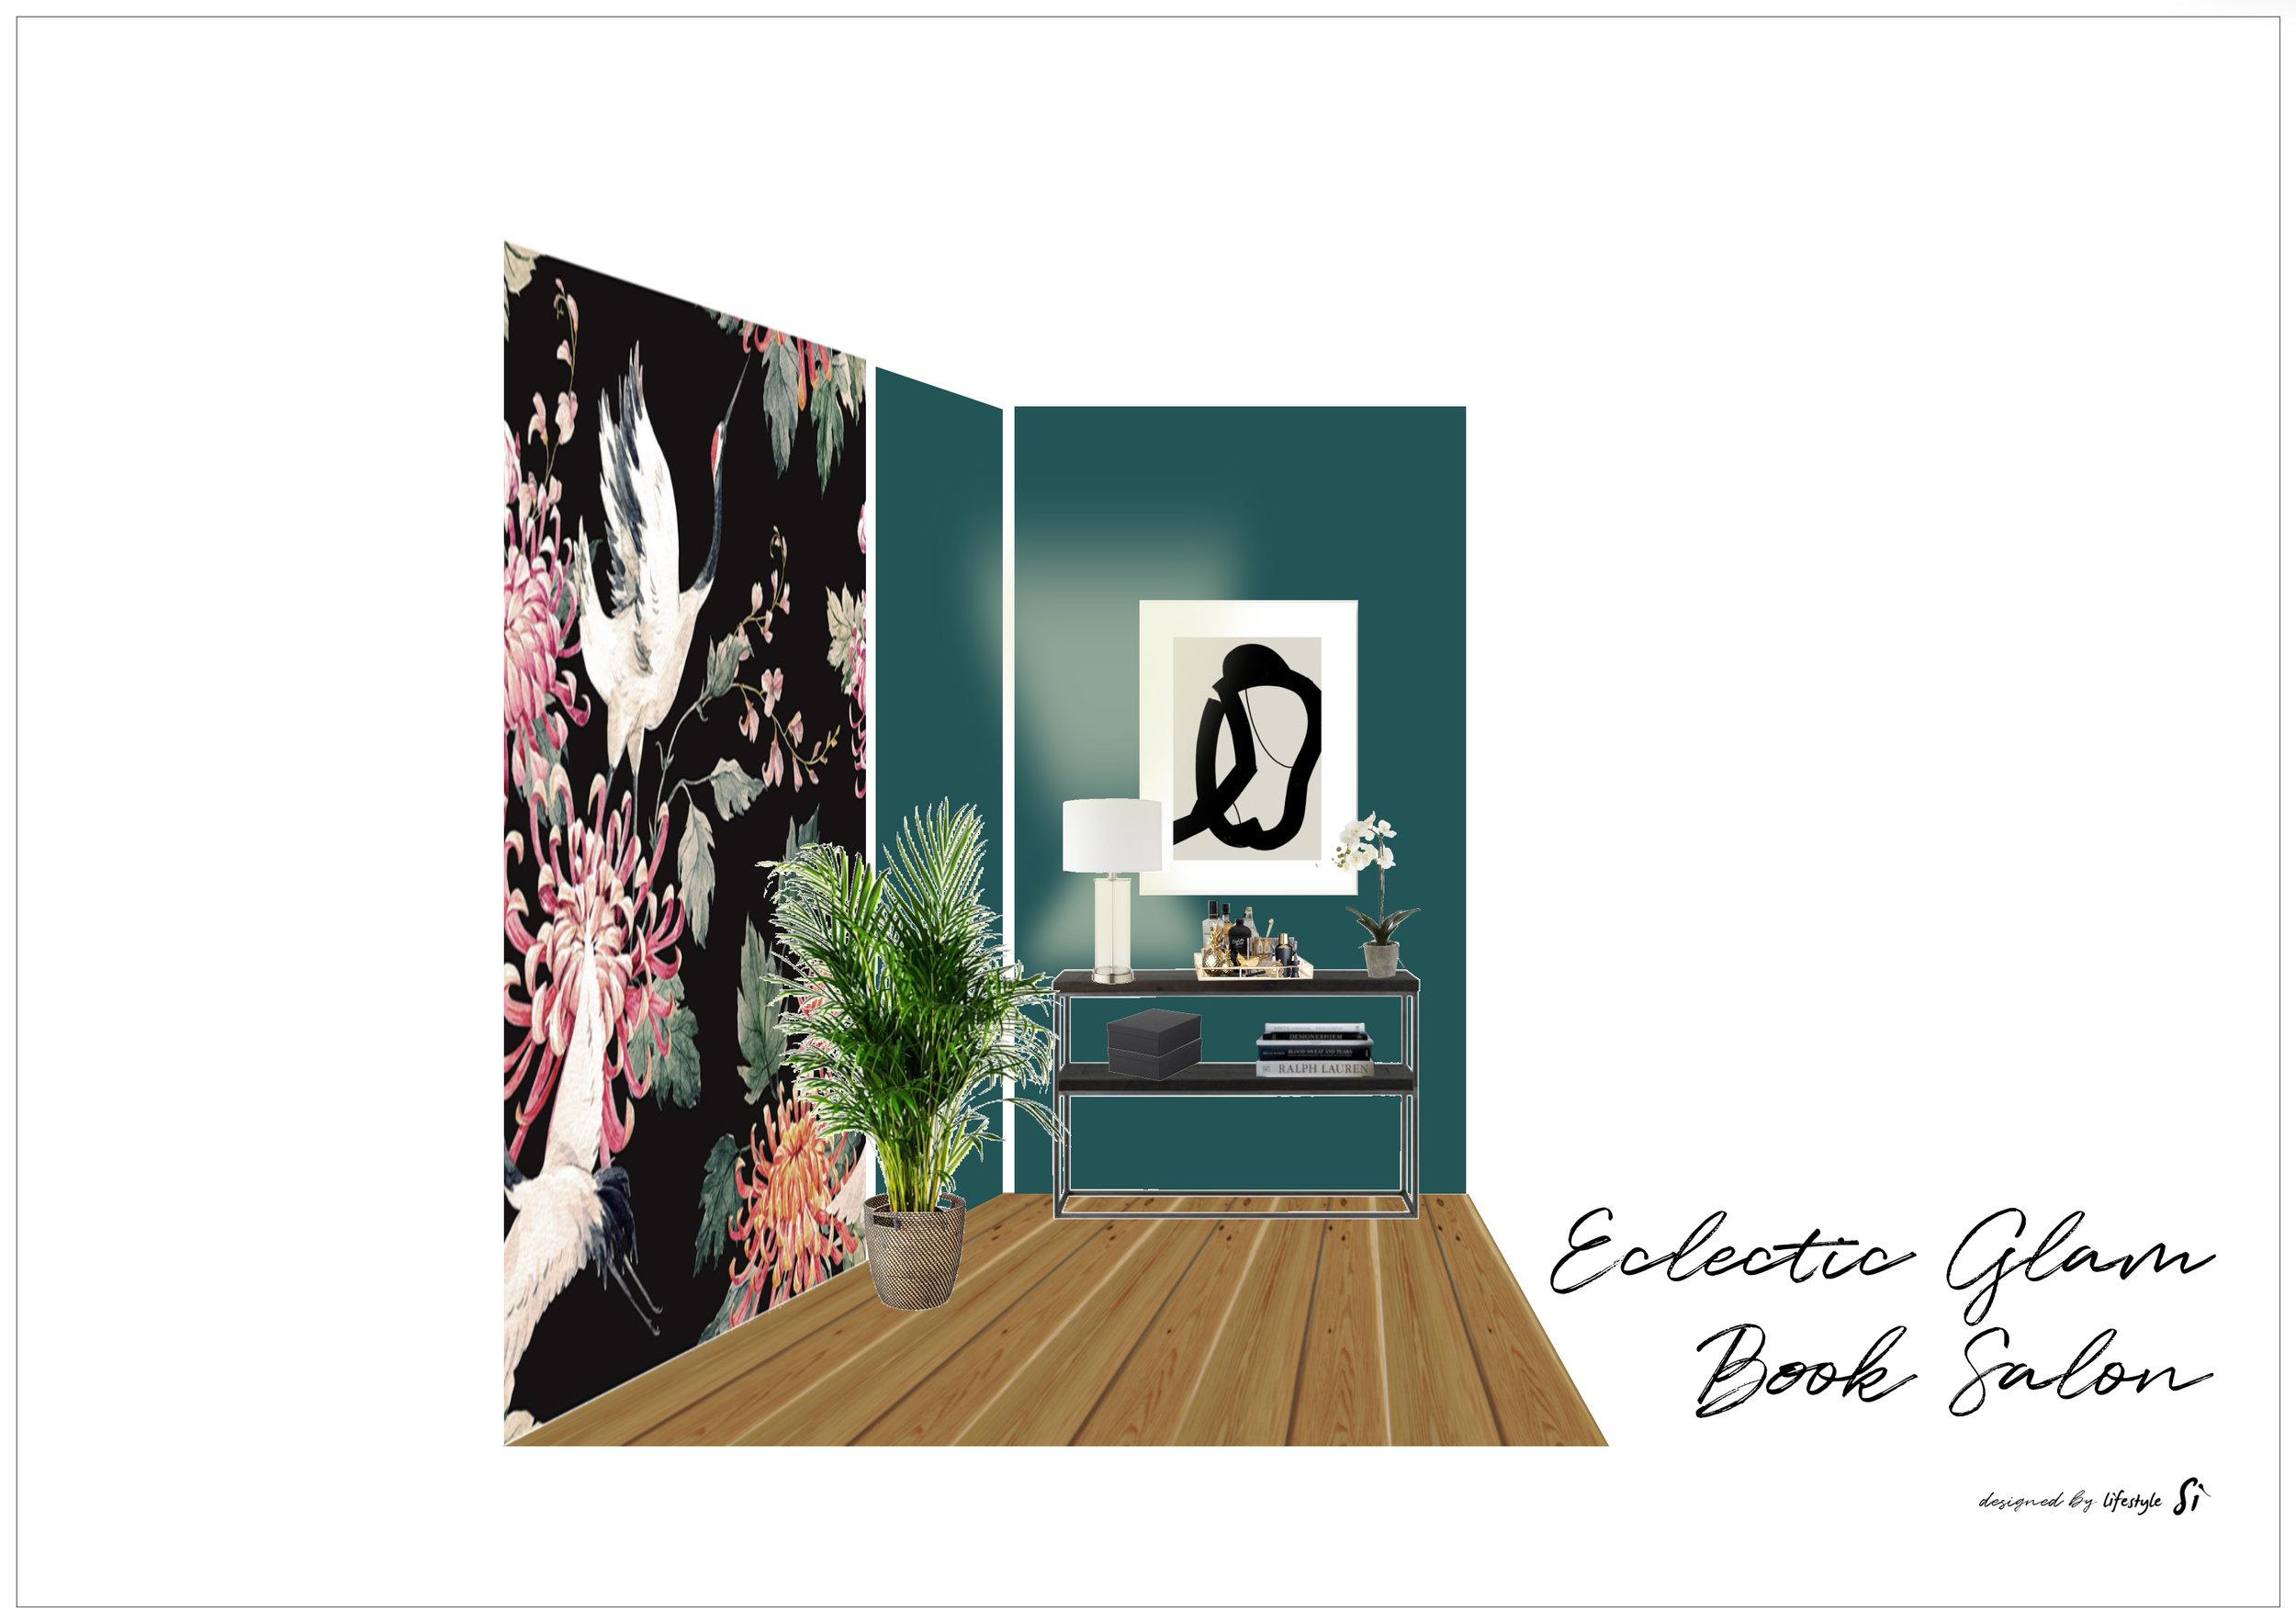 04_Concept Moodboard 2 e-design by lifestyle Si.jpg